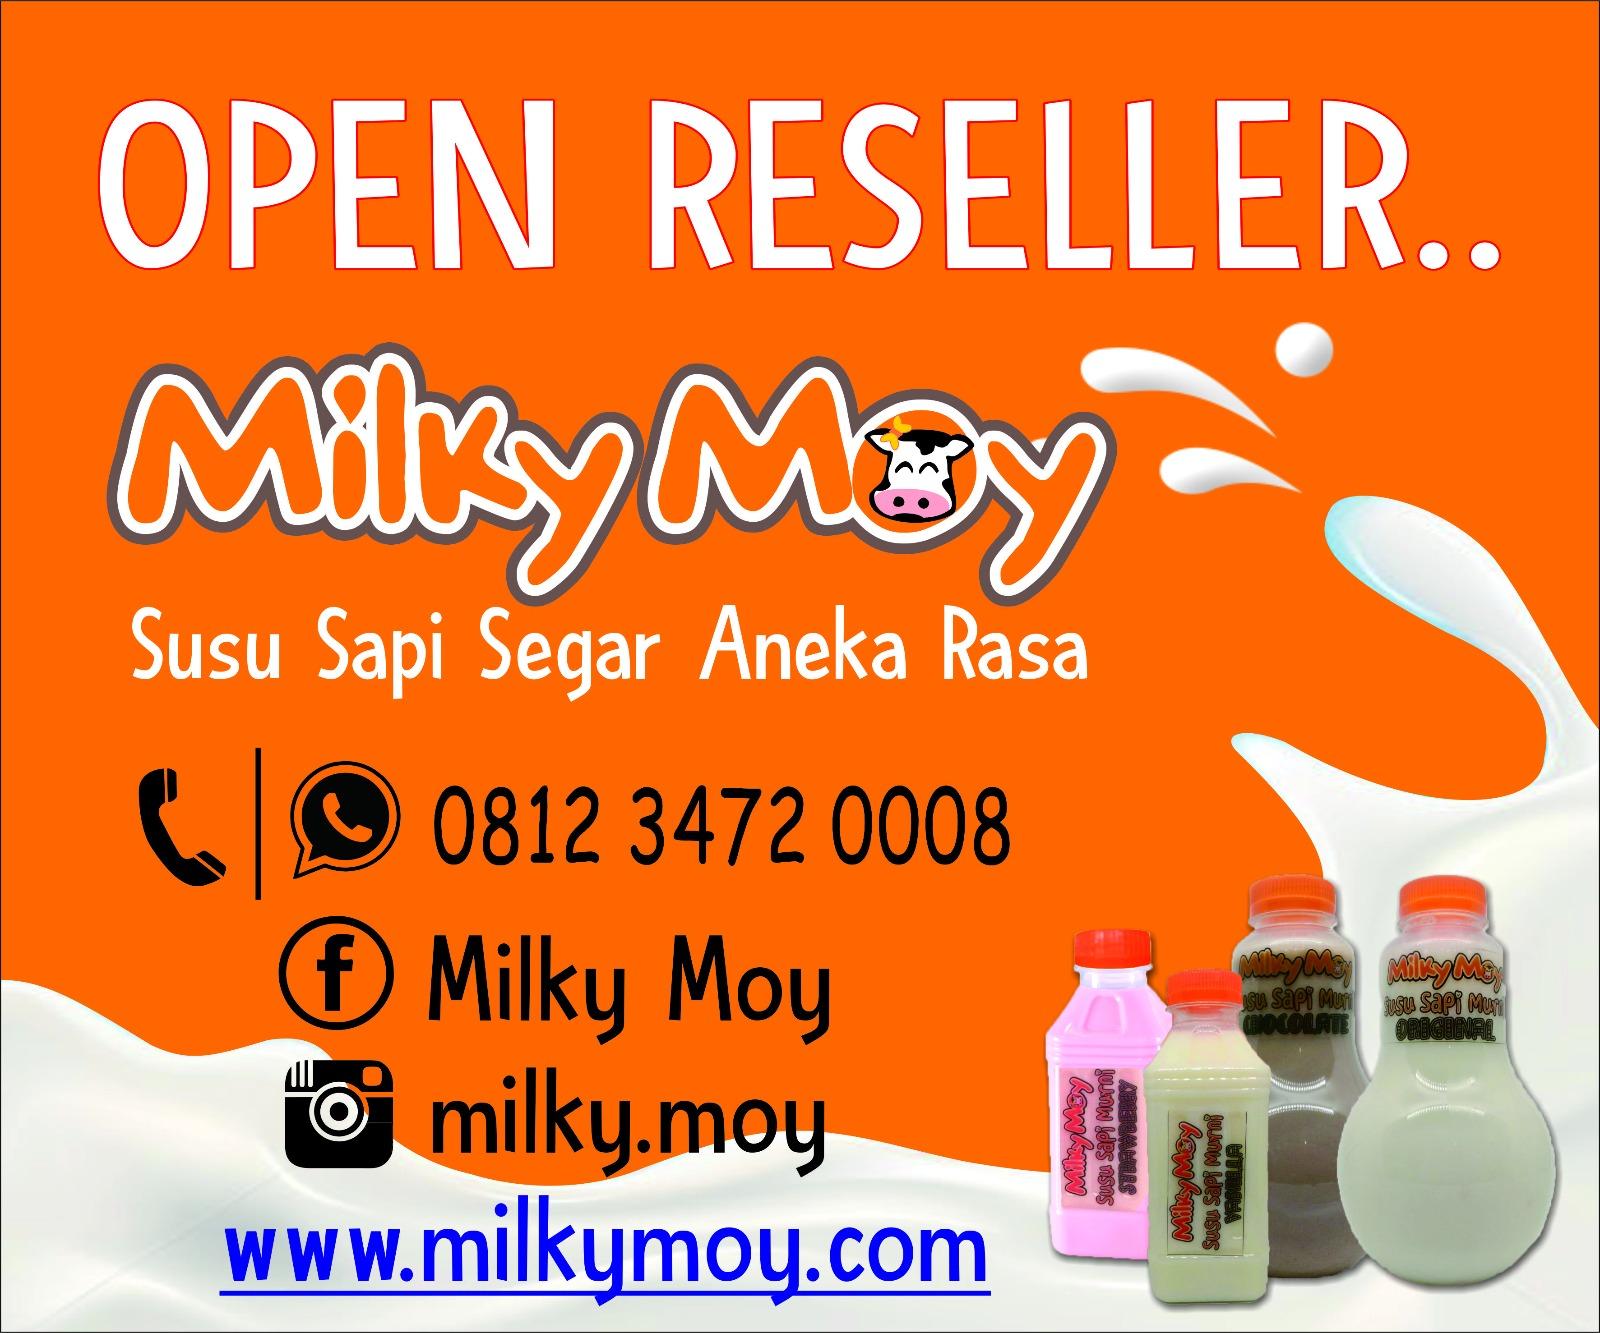 Milky Moy